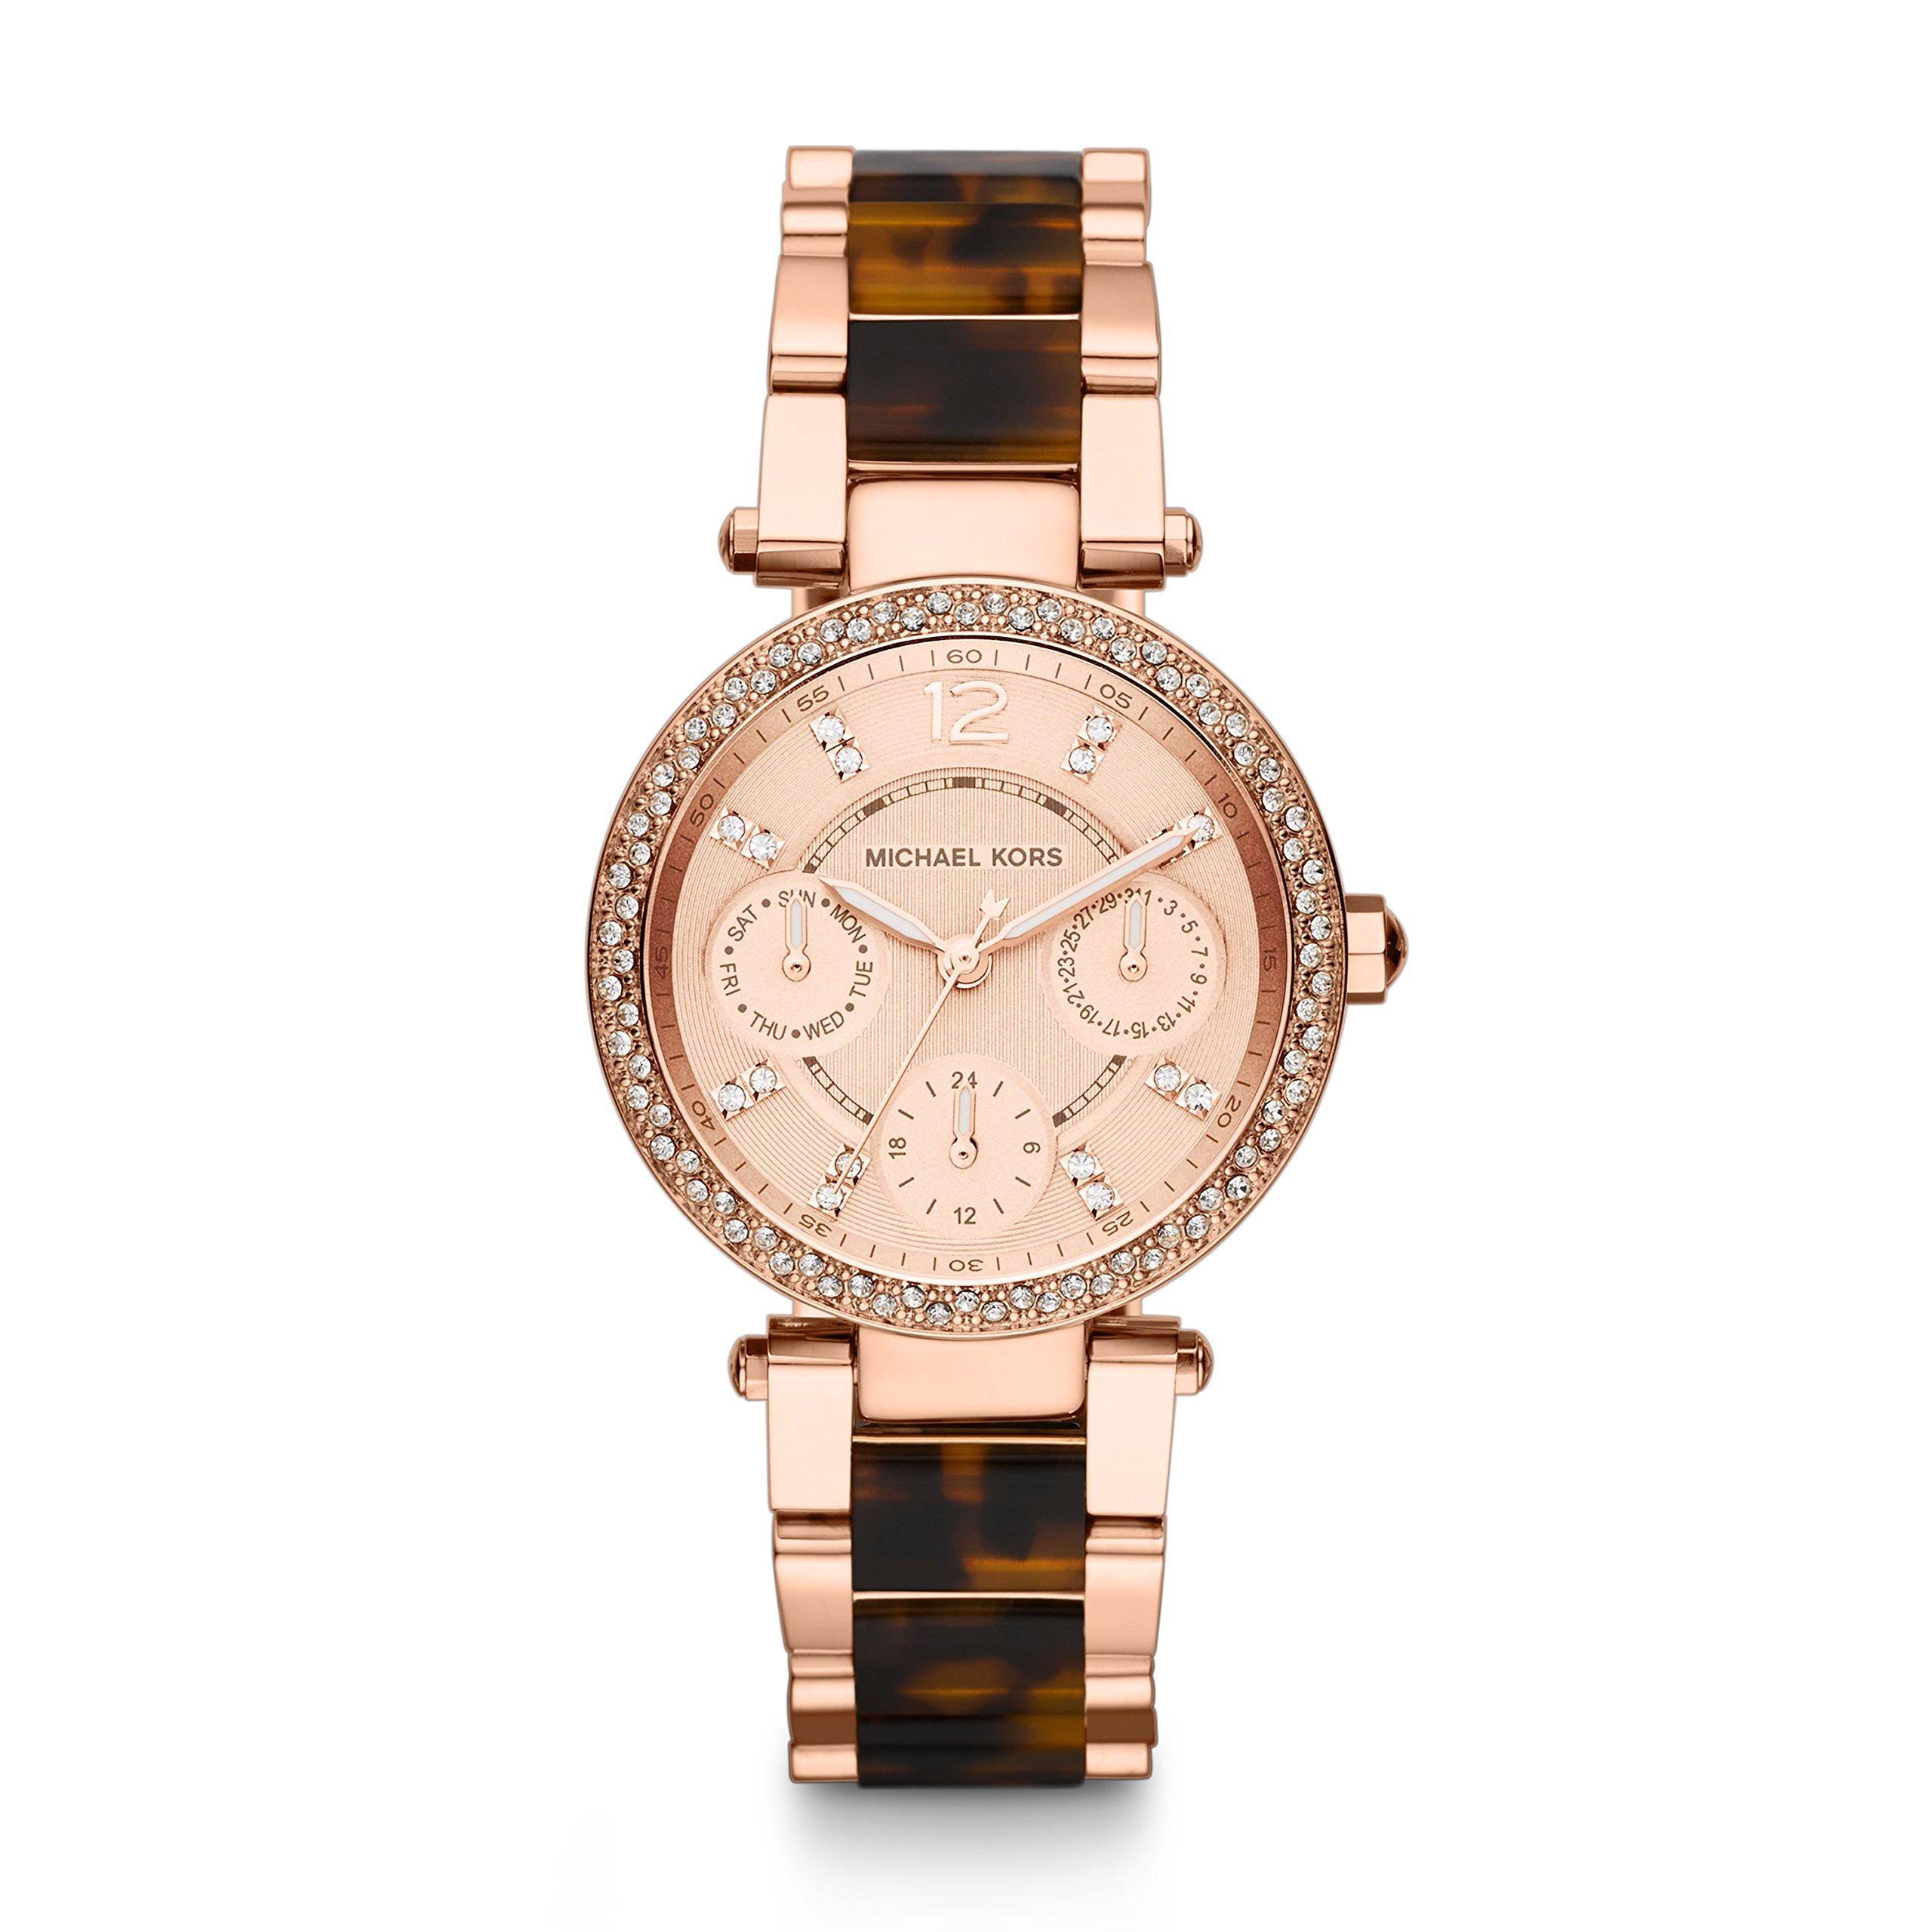 Michael Kors Two-Tone Glitz Parker Watch